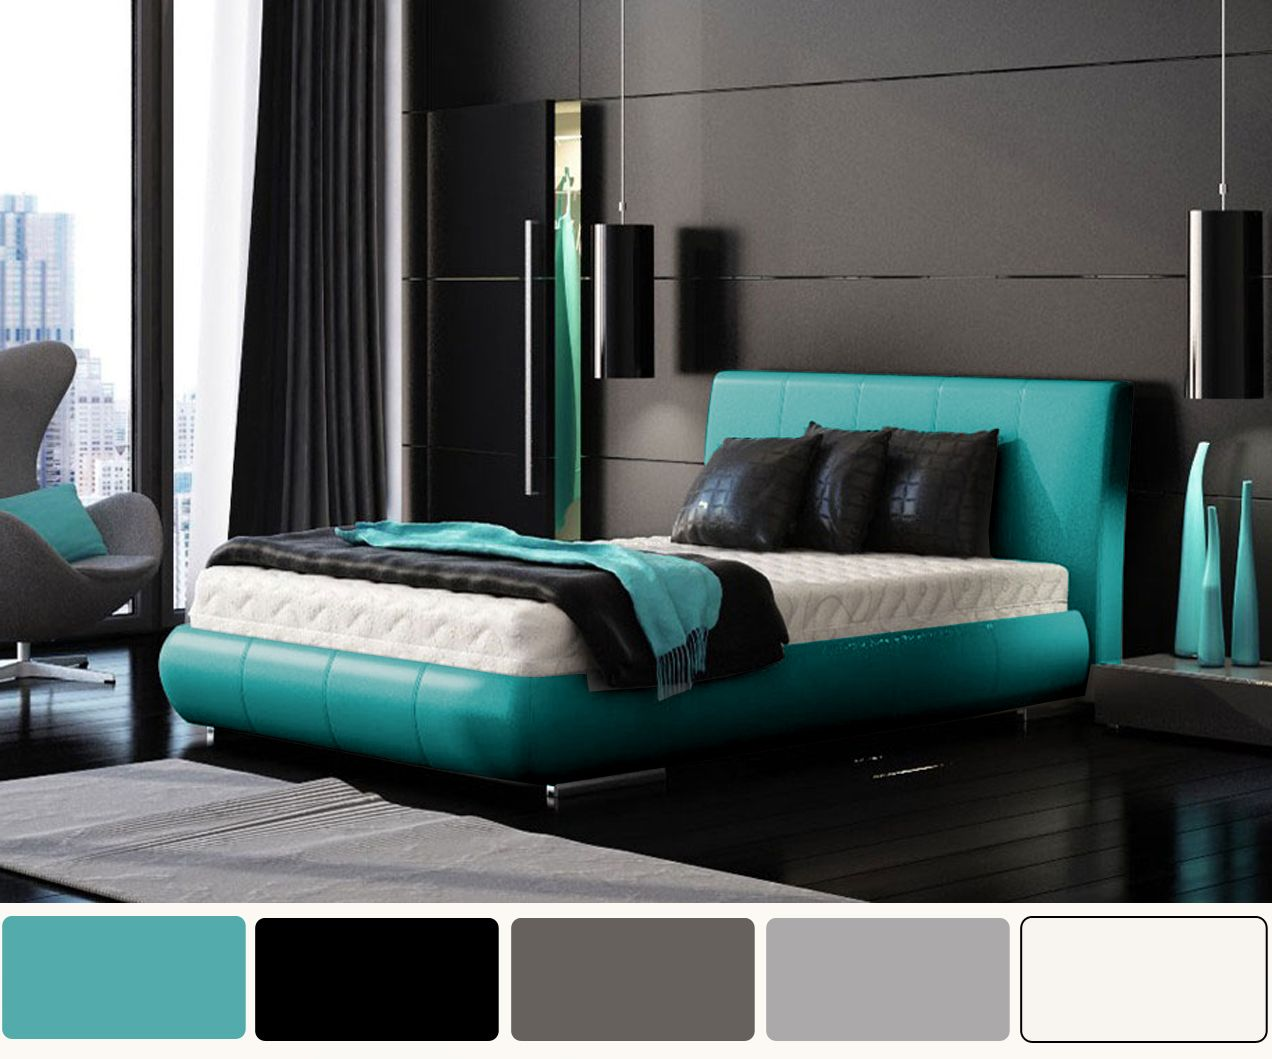 Aqua bedroom ideas black and turquoise bedroom ideas decors art decorating ideas